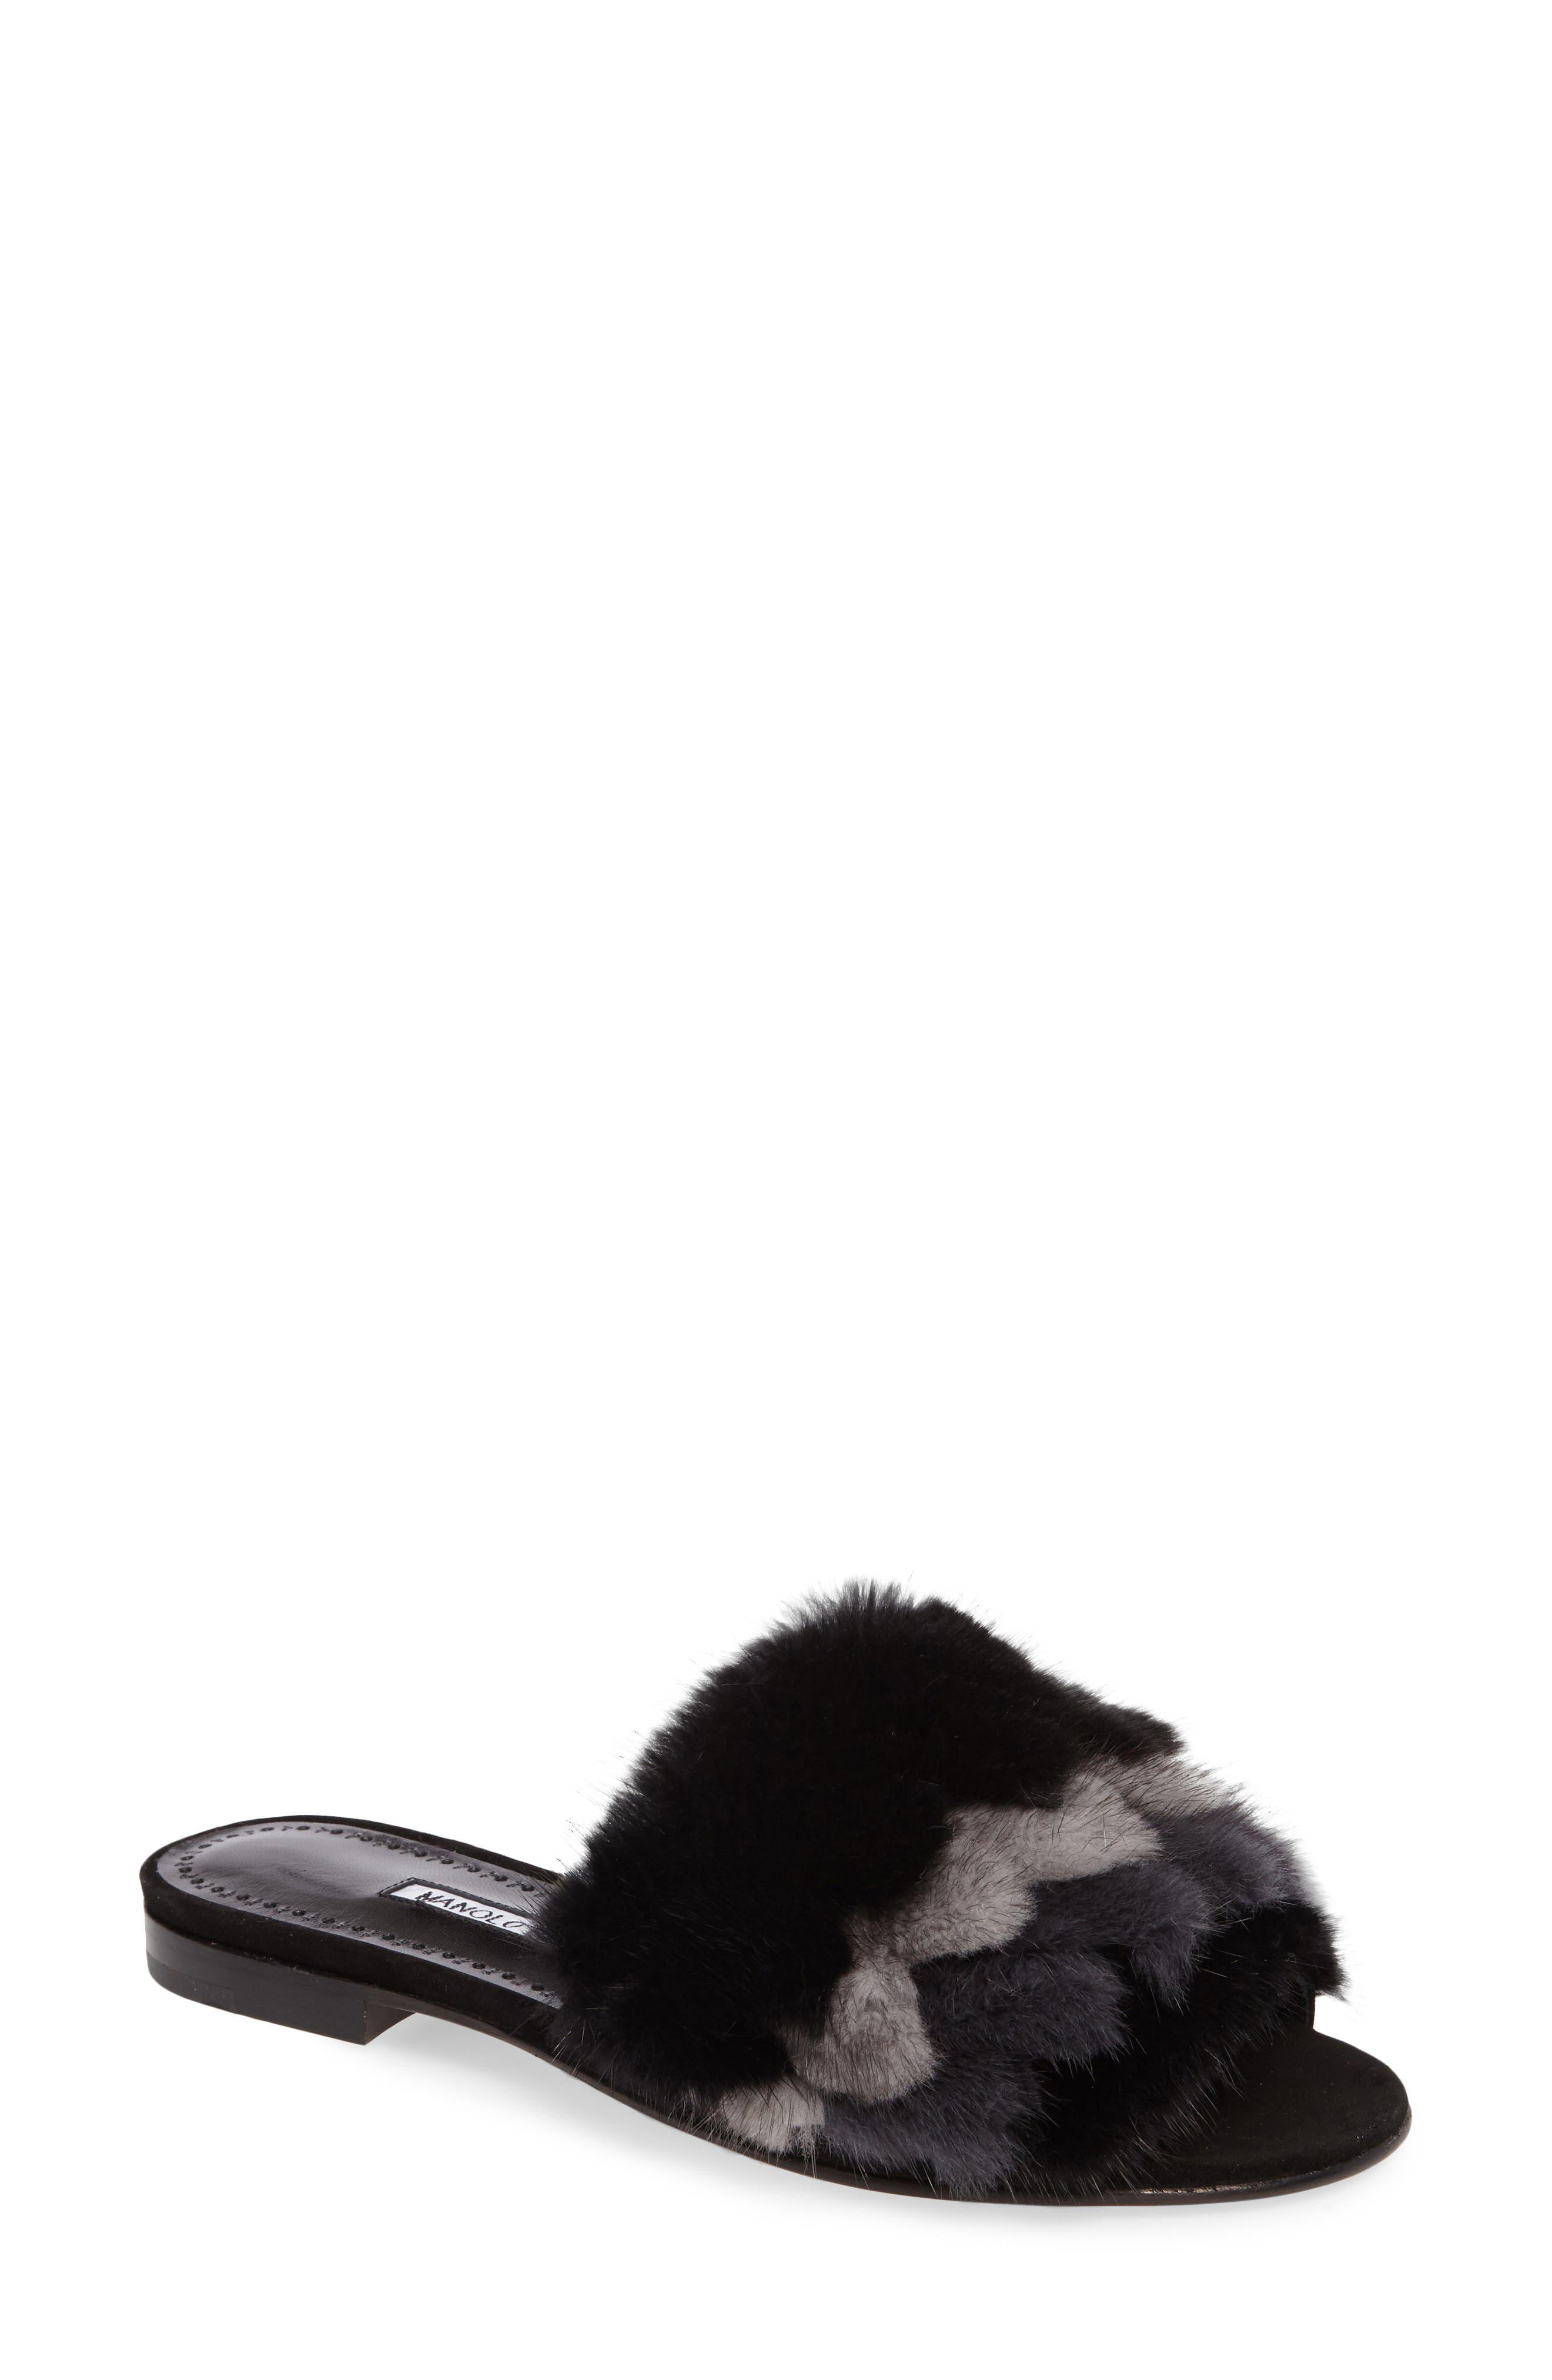 Pelosusmin Genuine Mink Fur Slide Sandal,                         Main,                         color, 001